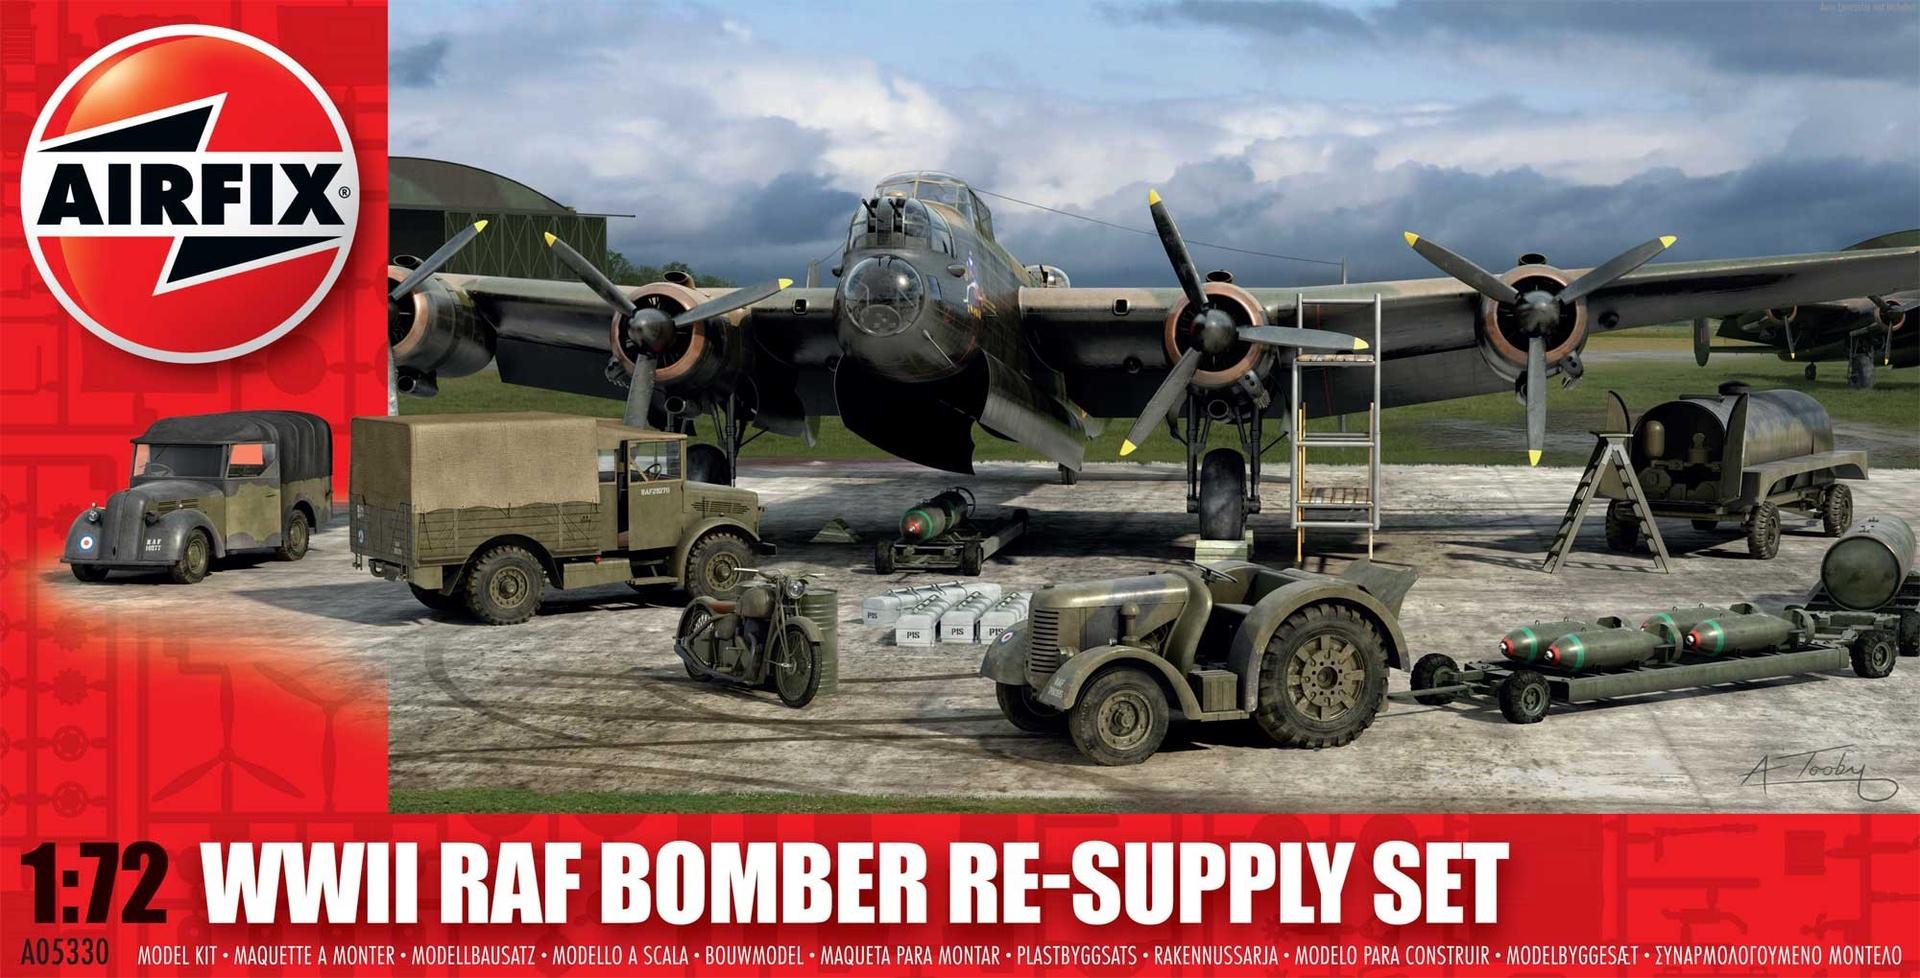 Airfix #A05330 1/72 WW11 RAF Bomber Re-Supply Set